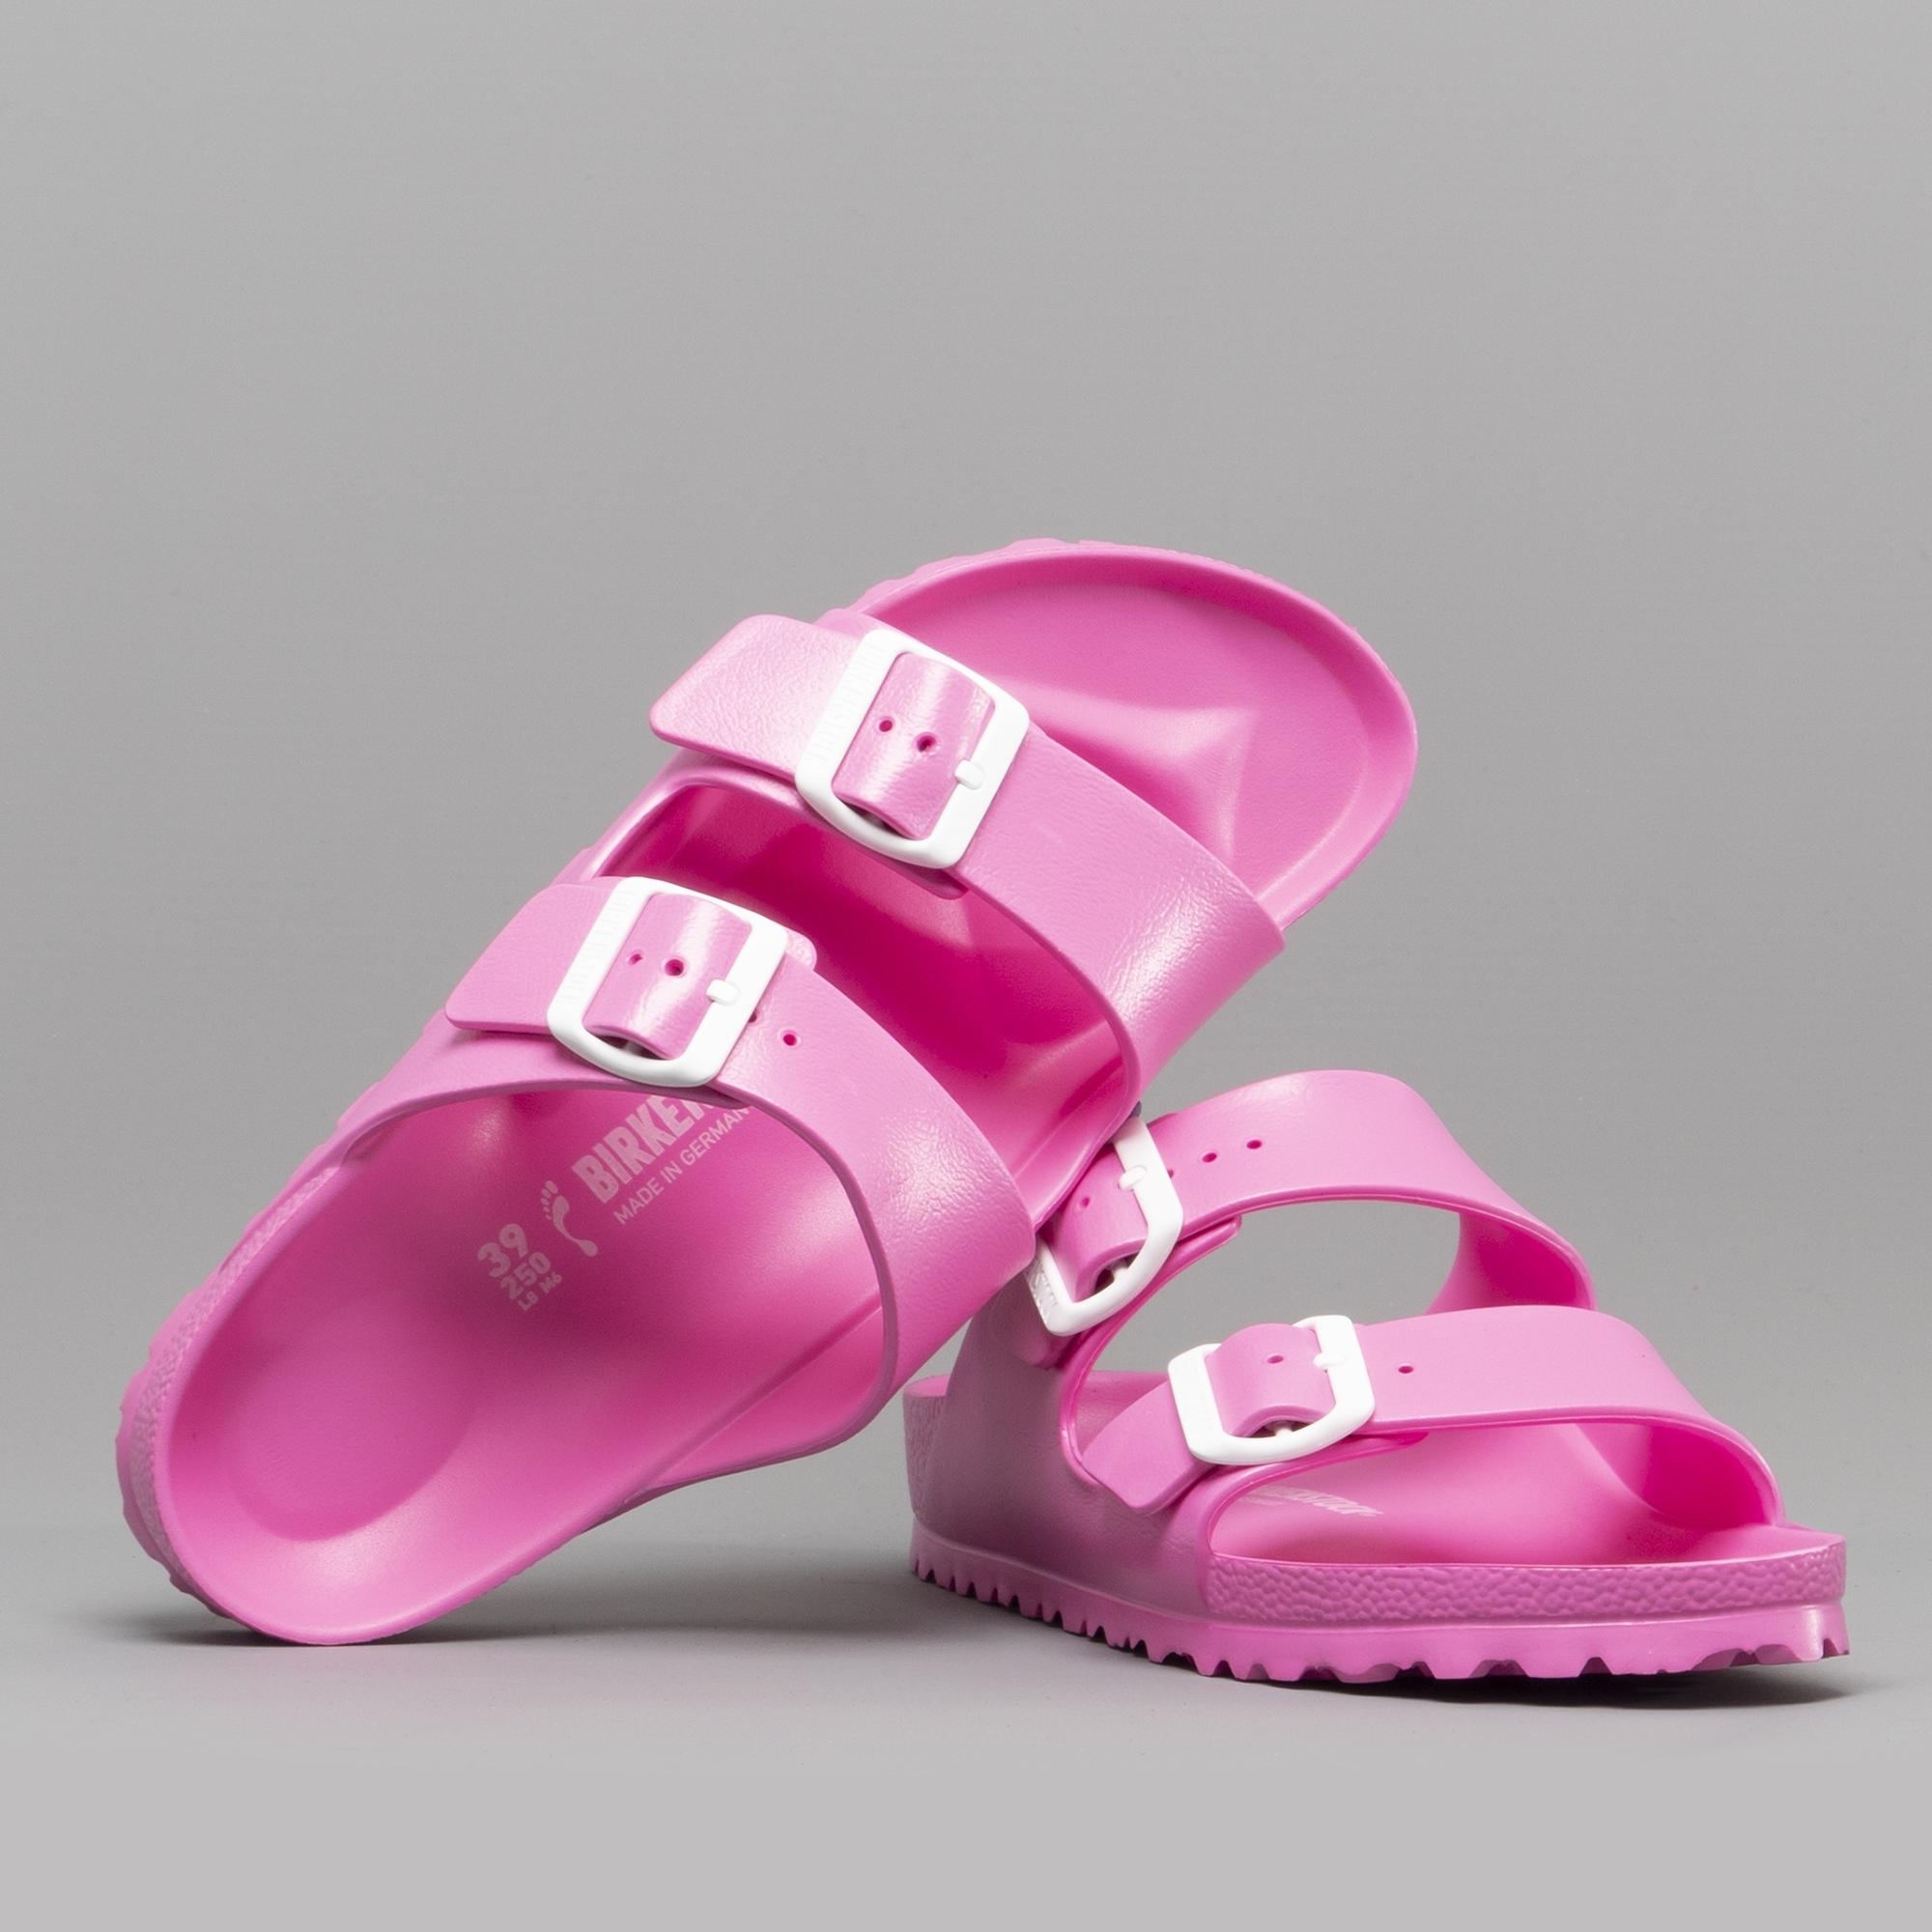 d5c5b2fddfa Birkenstock ARIZONA 129533 Ladies Two Strap Sandals Neon Pink